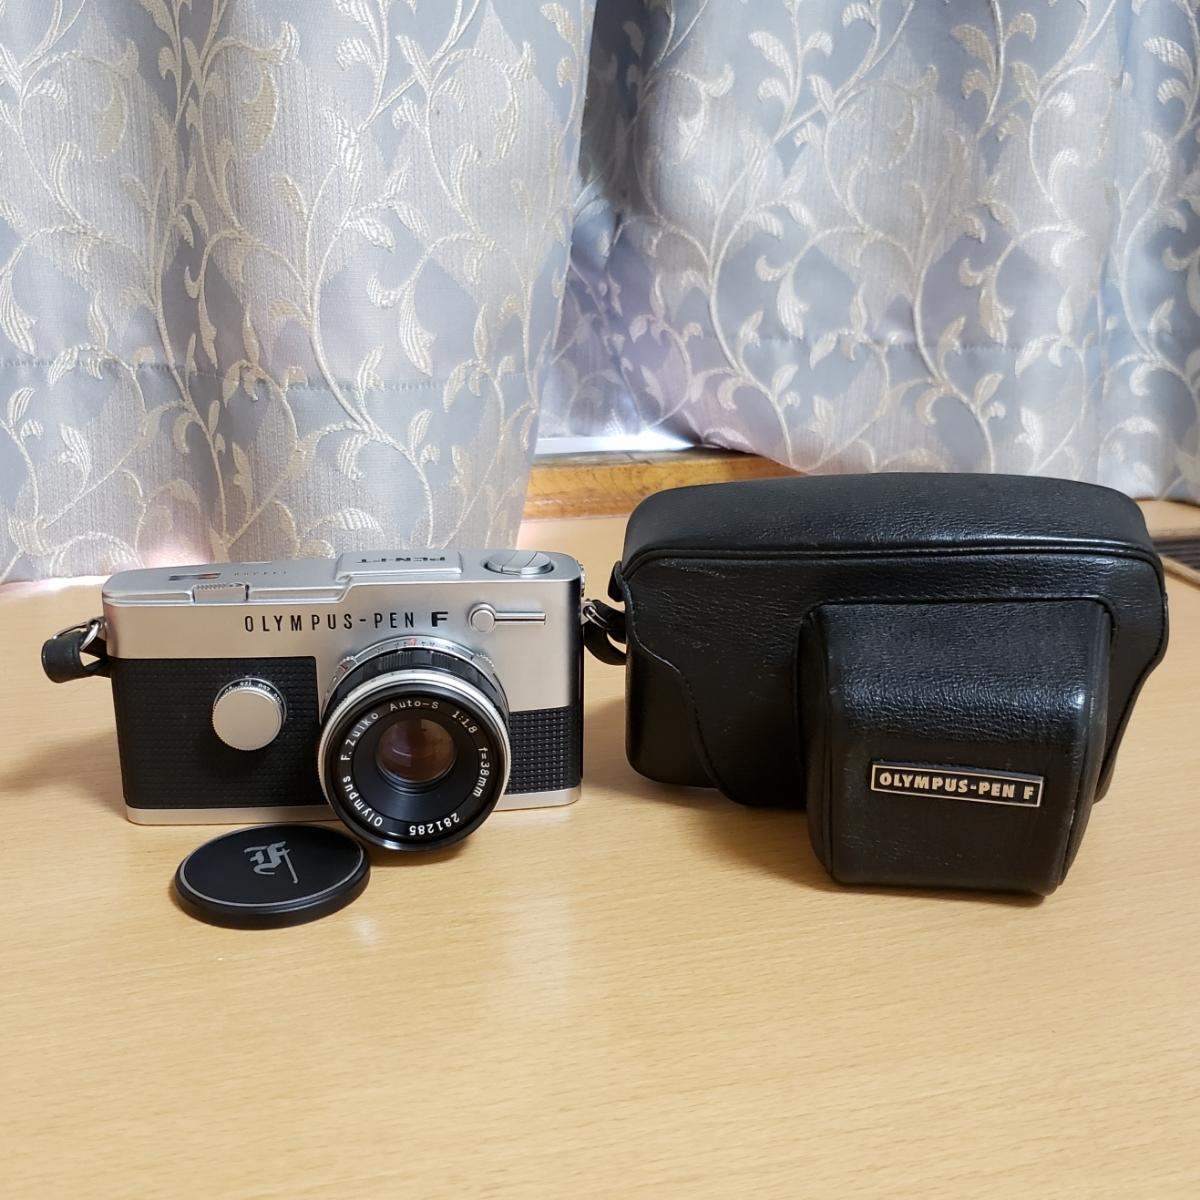 OLYMPUS PEN-FT F.ZUIKO Auto-S 1:1.8 f=38mm オリンパス フイルムカメラ ケース付 中古